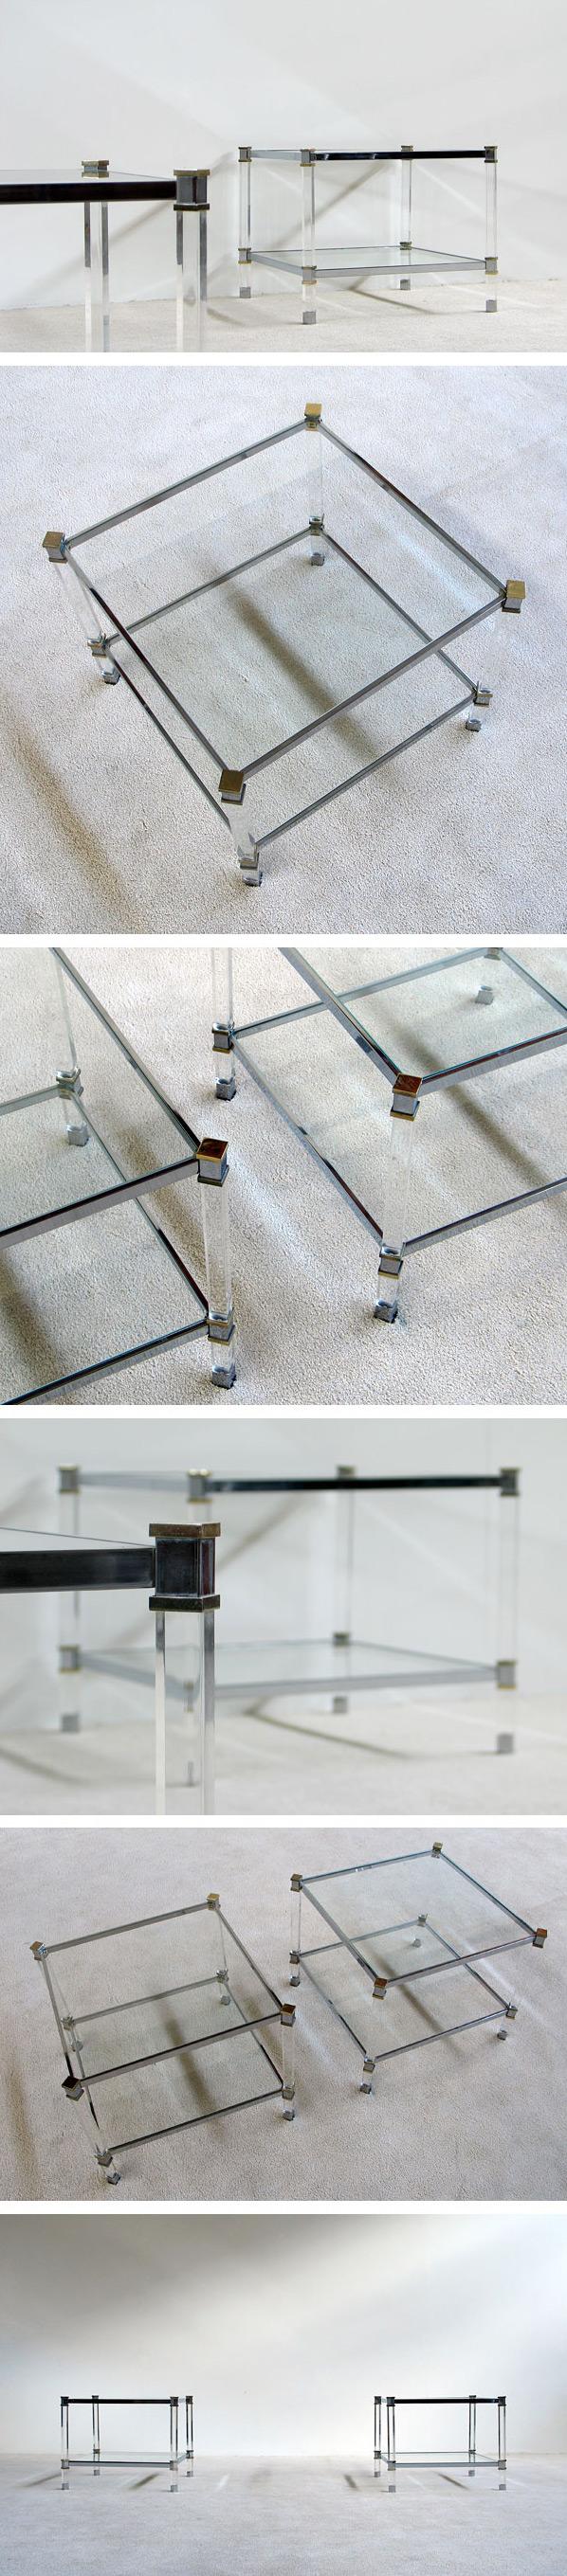 2 lucite chrome side tables Karl Springer Large